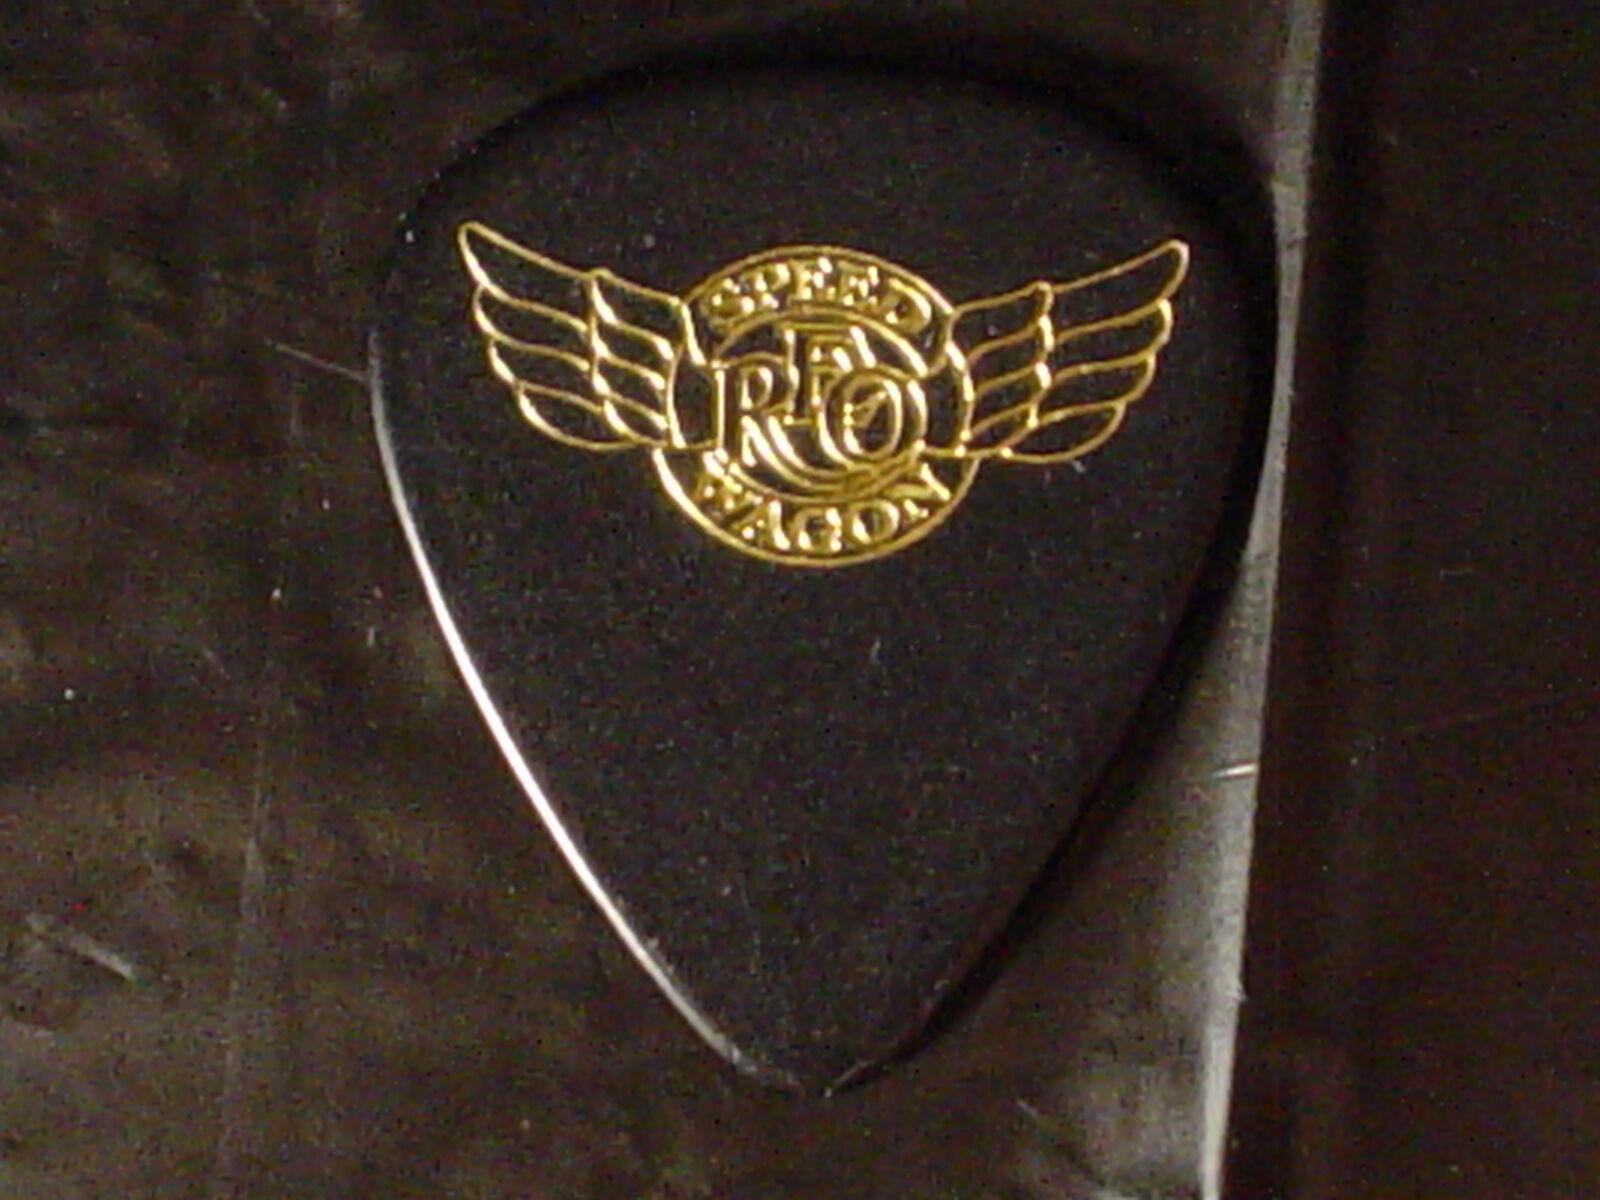 REO SPEEDWAGON Classic Rock Band Logo BRUCE HALL 1999 Concert Tour GUITAR PICK